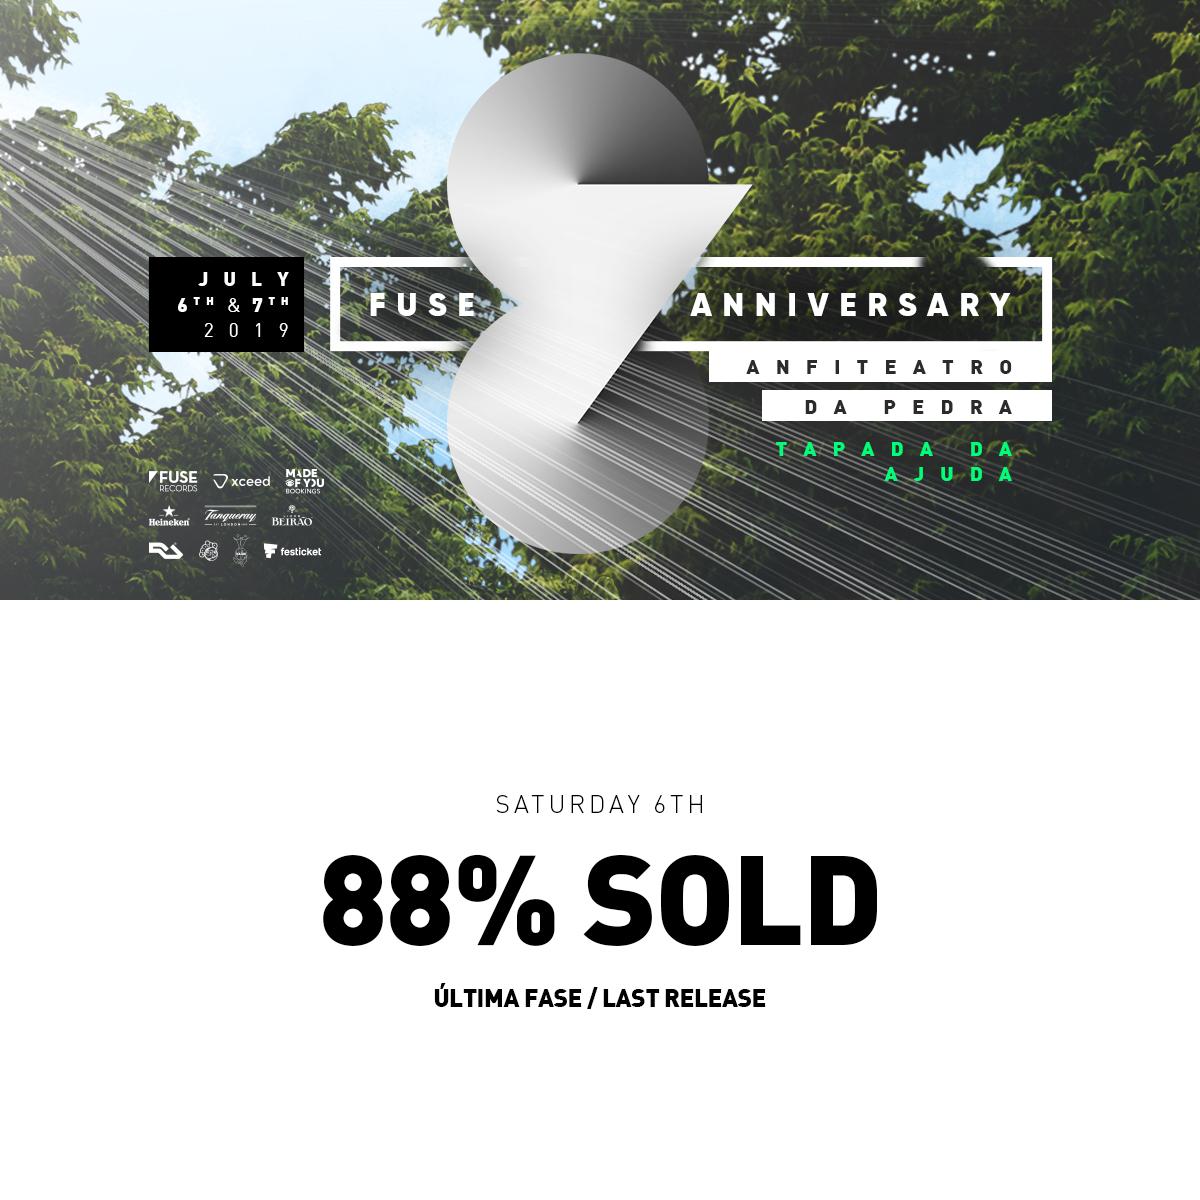 88_FuseMatine_aniversario_Profile_Sold.jpg